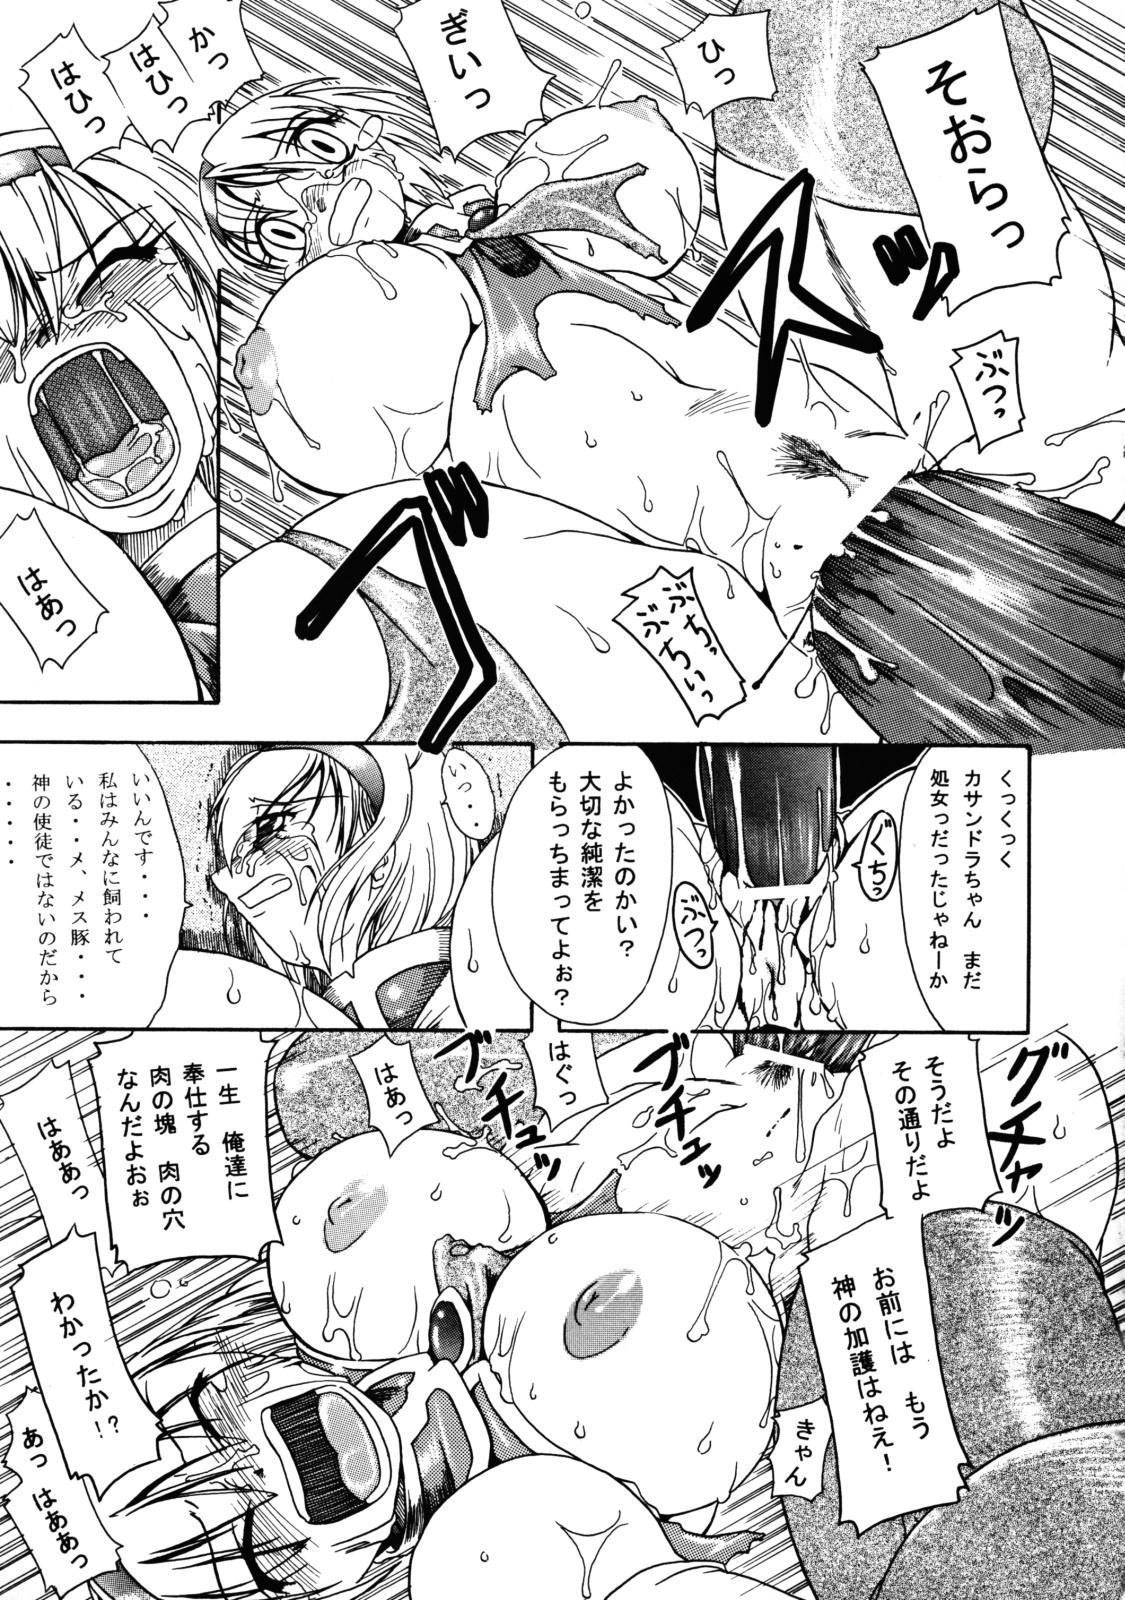 Kakugee Sanmai 3 17